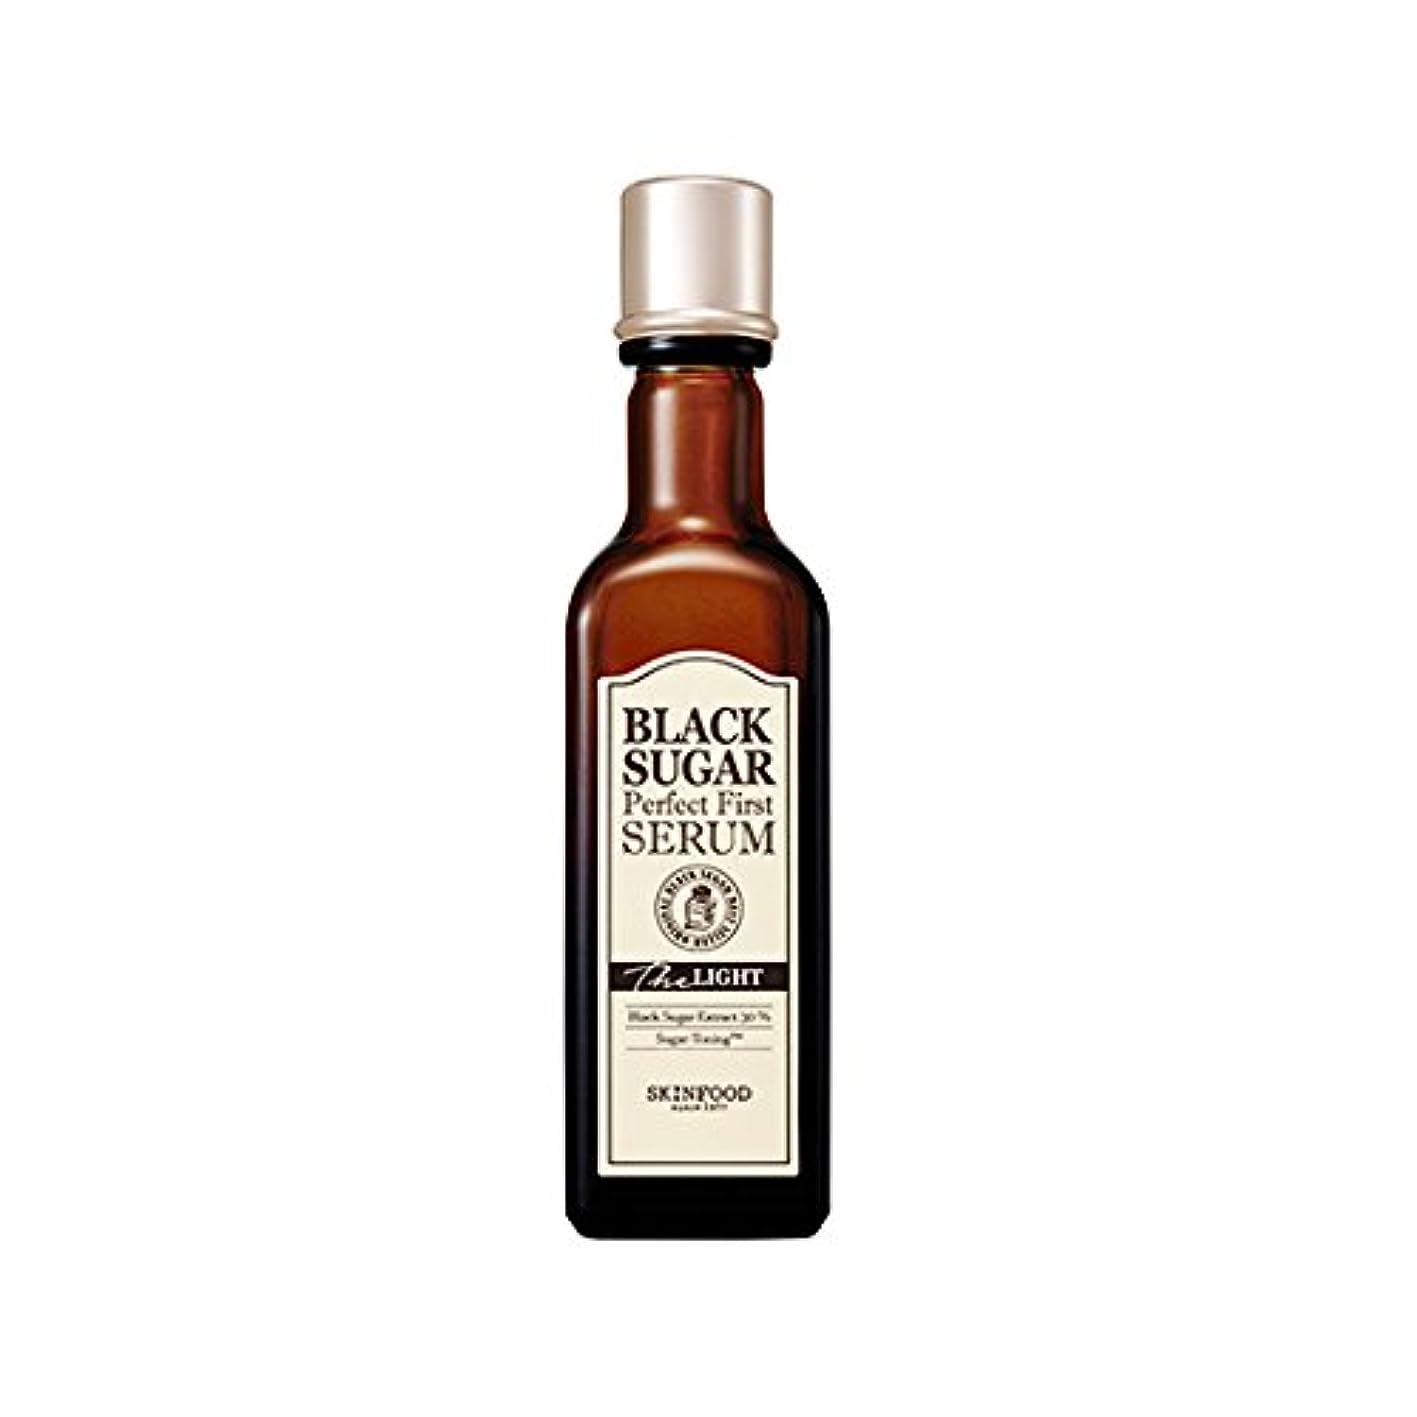 Skinfood black sugar perfect first serum the light/黒糖完全最初血清ライト/120ml + 60? [並行輸入品]